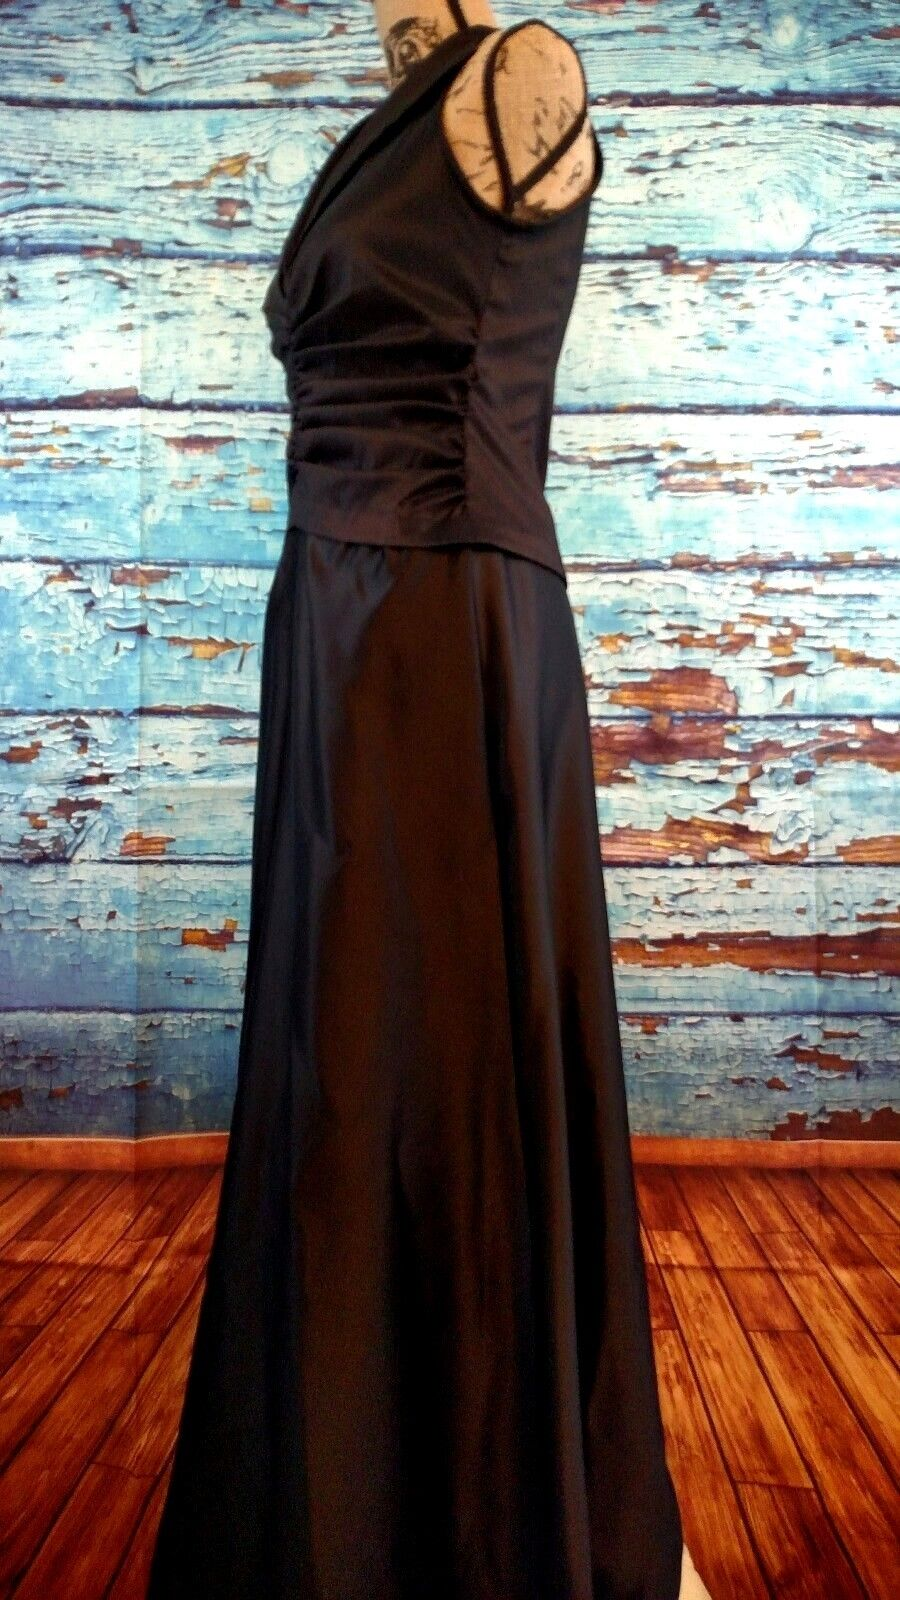 TADASHI Collection schwarz collarot ruched cocktail formal long gown dress Größe 6